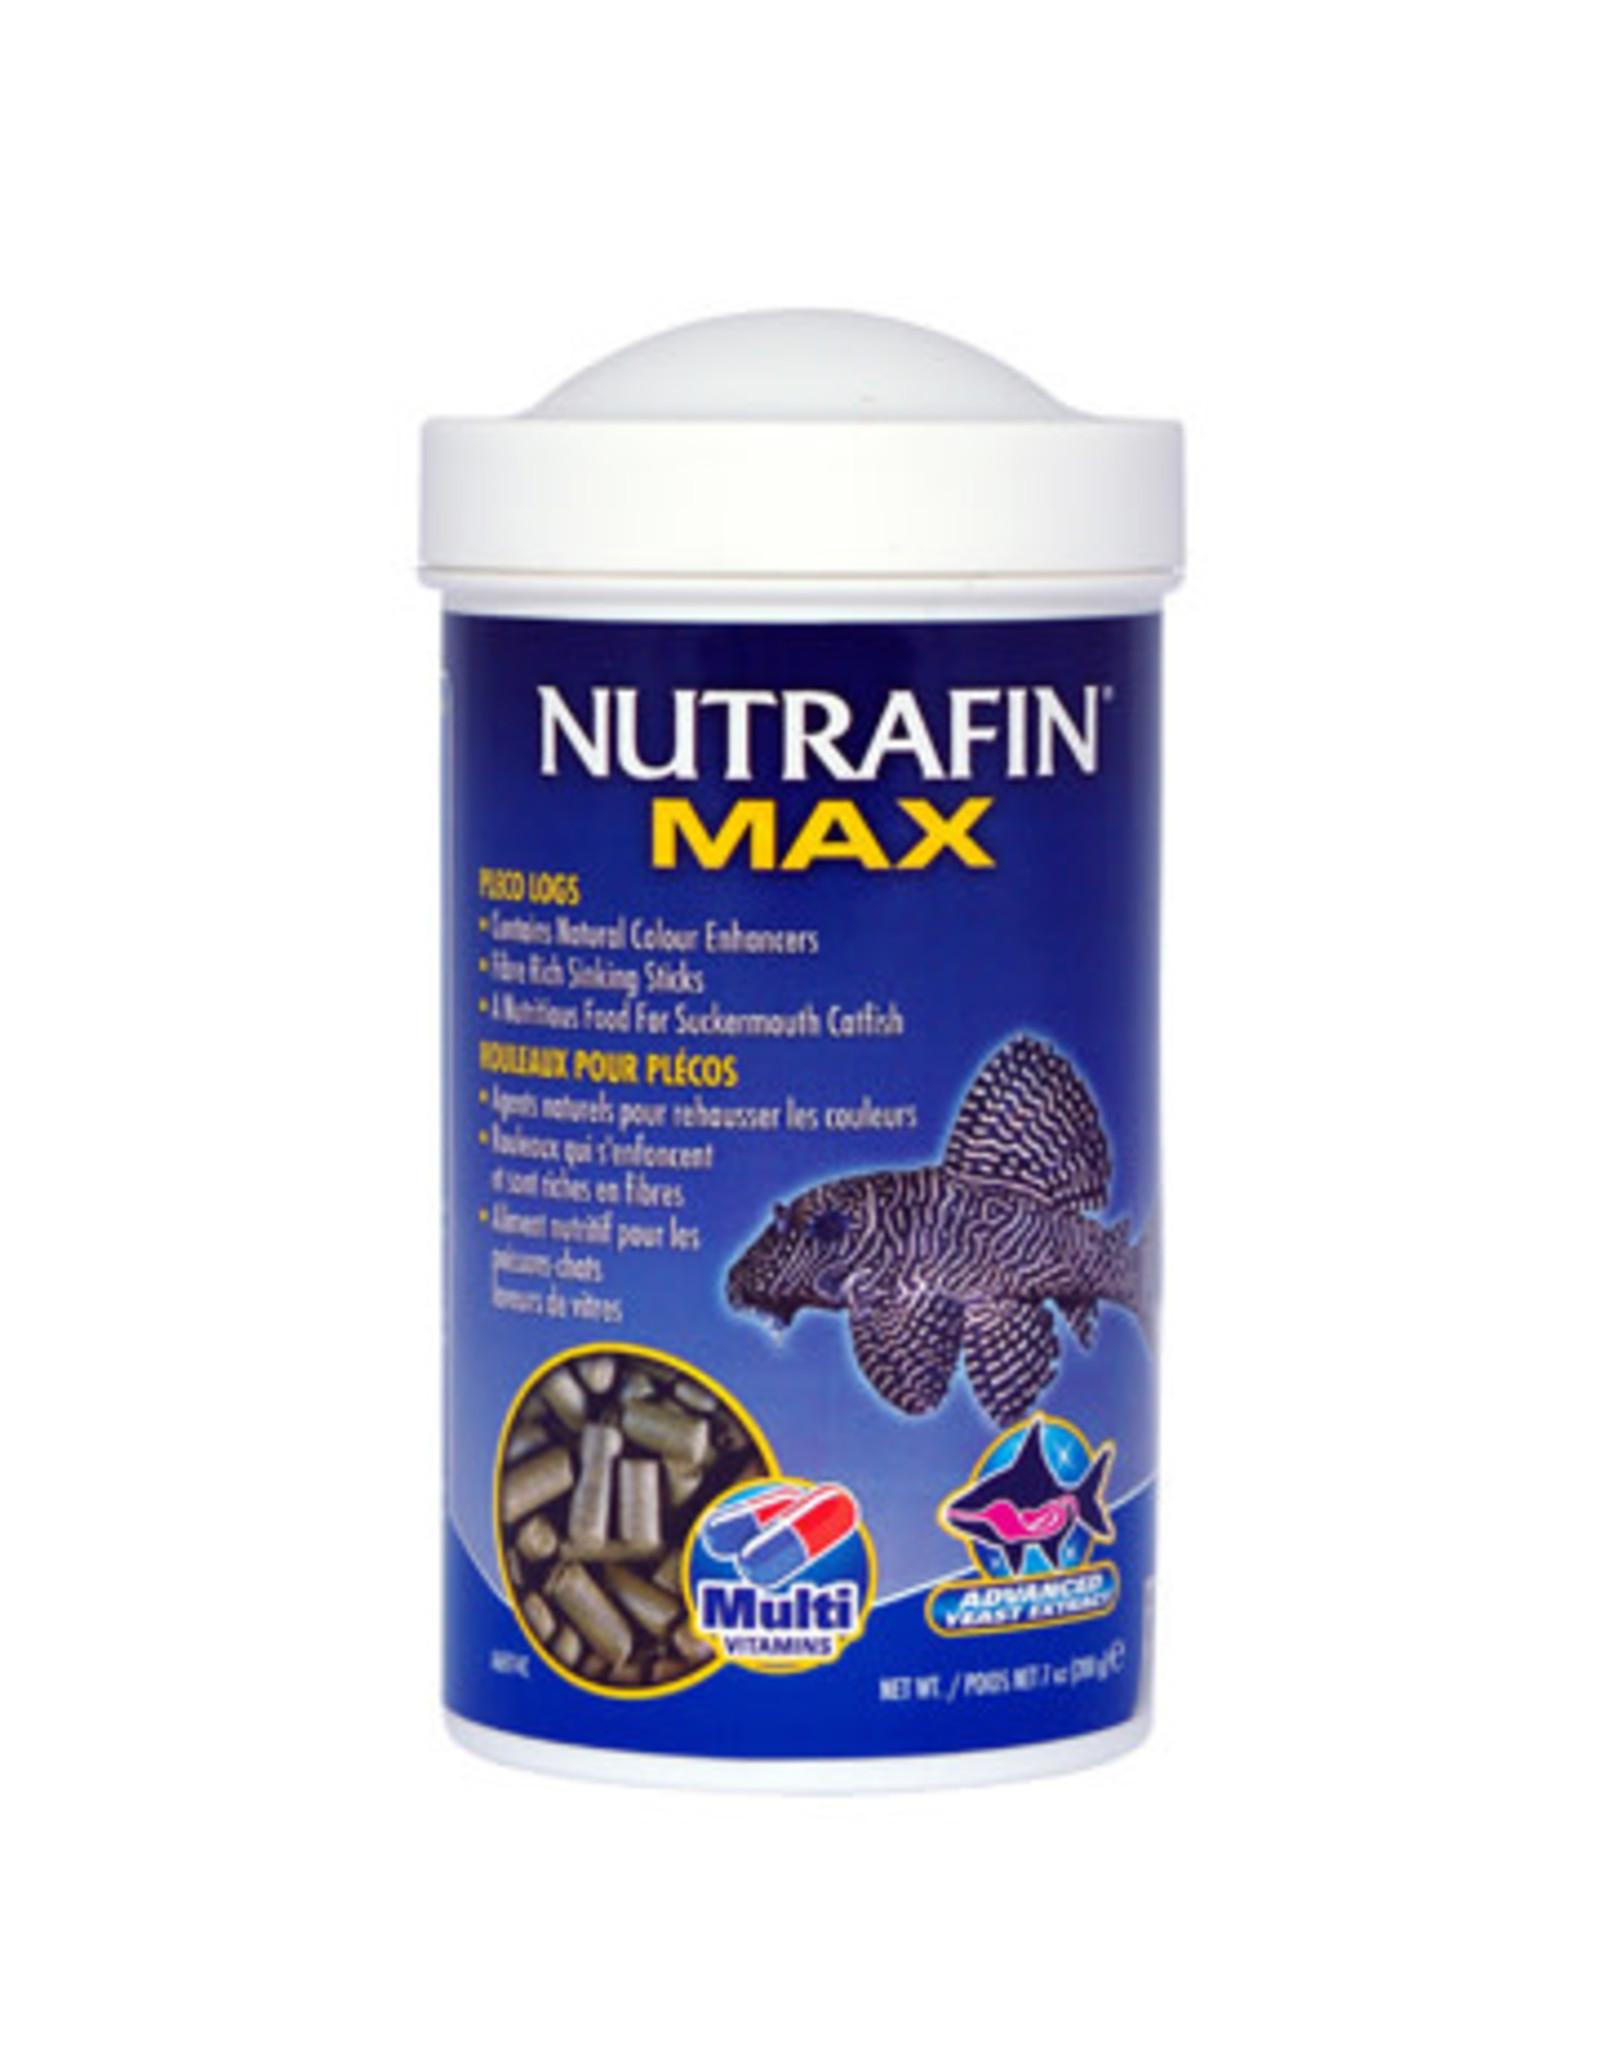 Nutrafin Nutrafin Max Pleco Logs 200 g (7.05 oz)